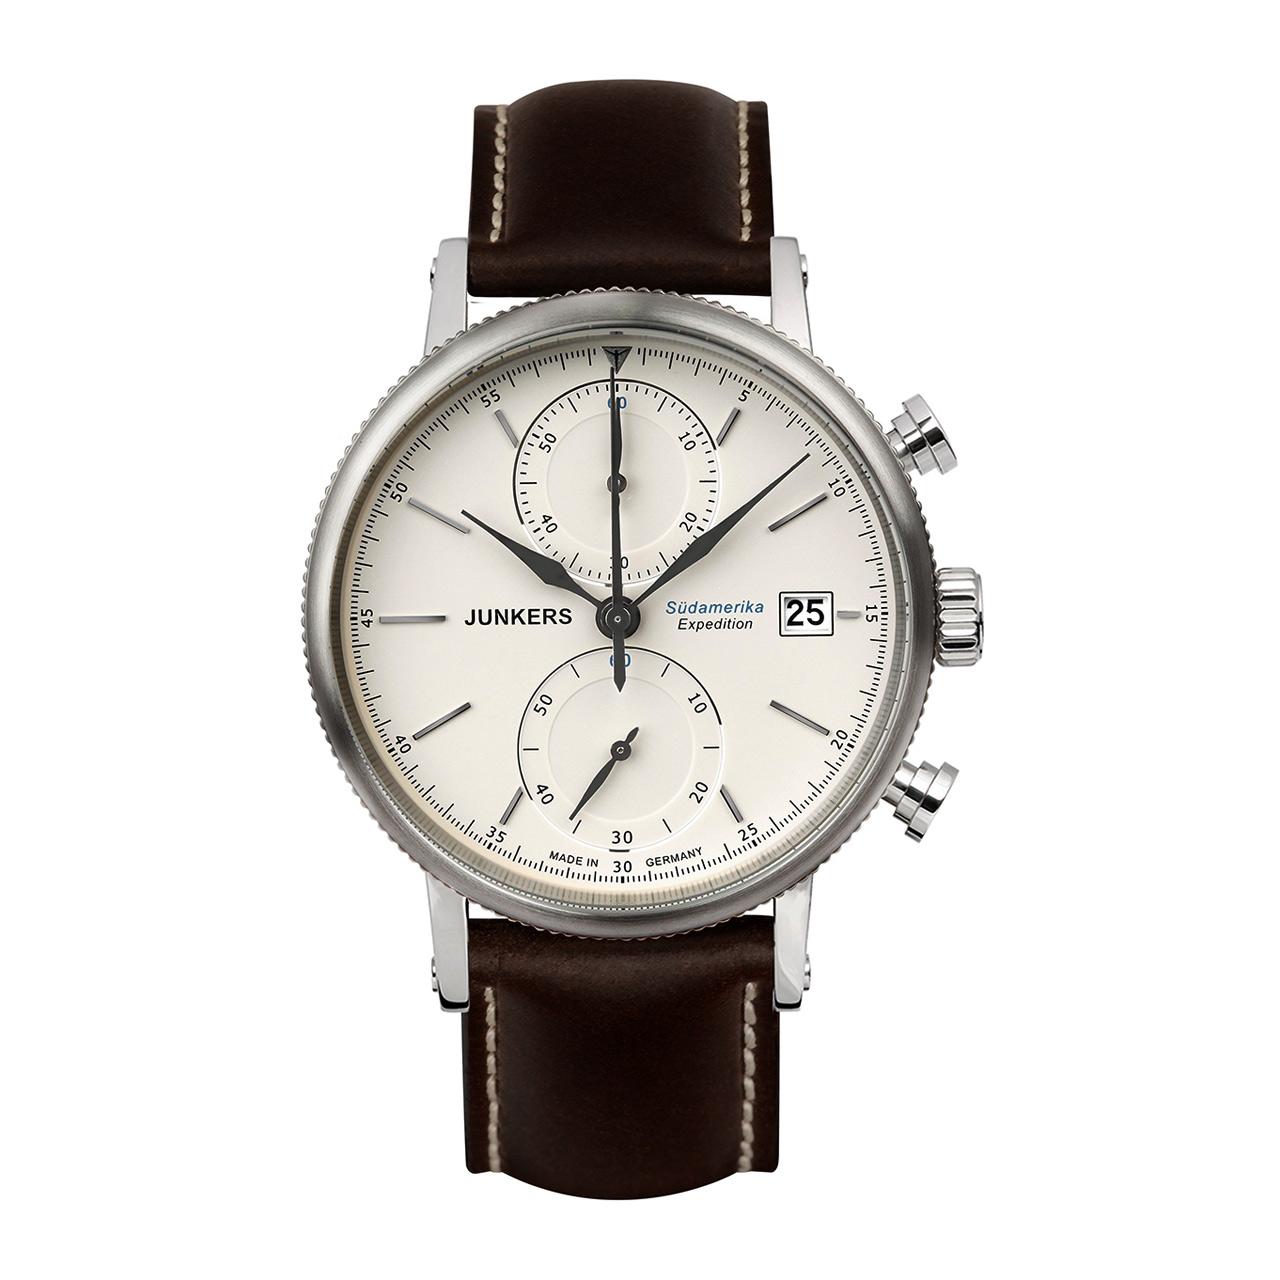 Junkers Serie Expedition Südamerika 6588-5 Herren Chronograph